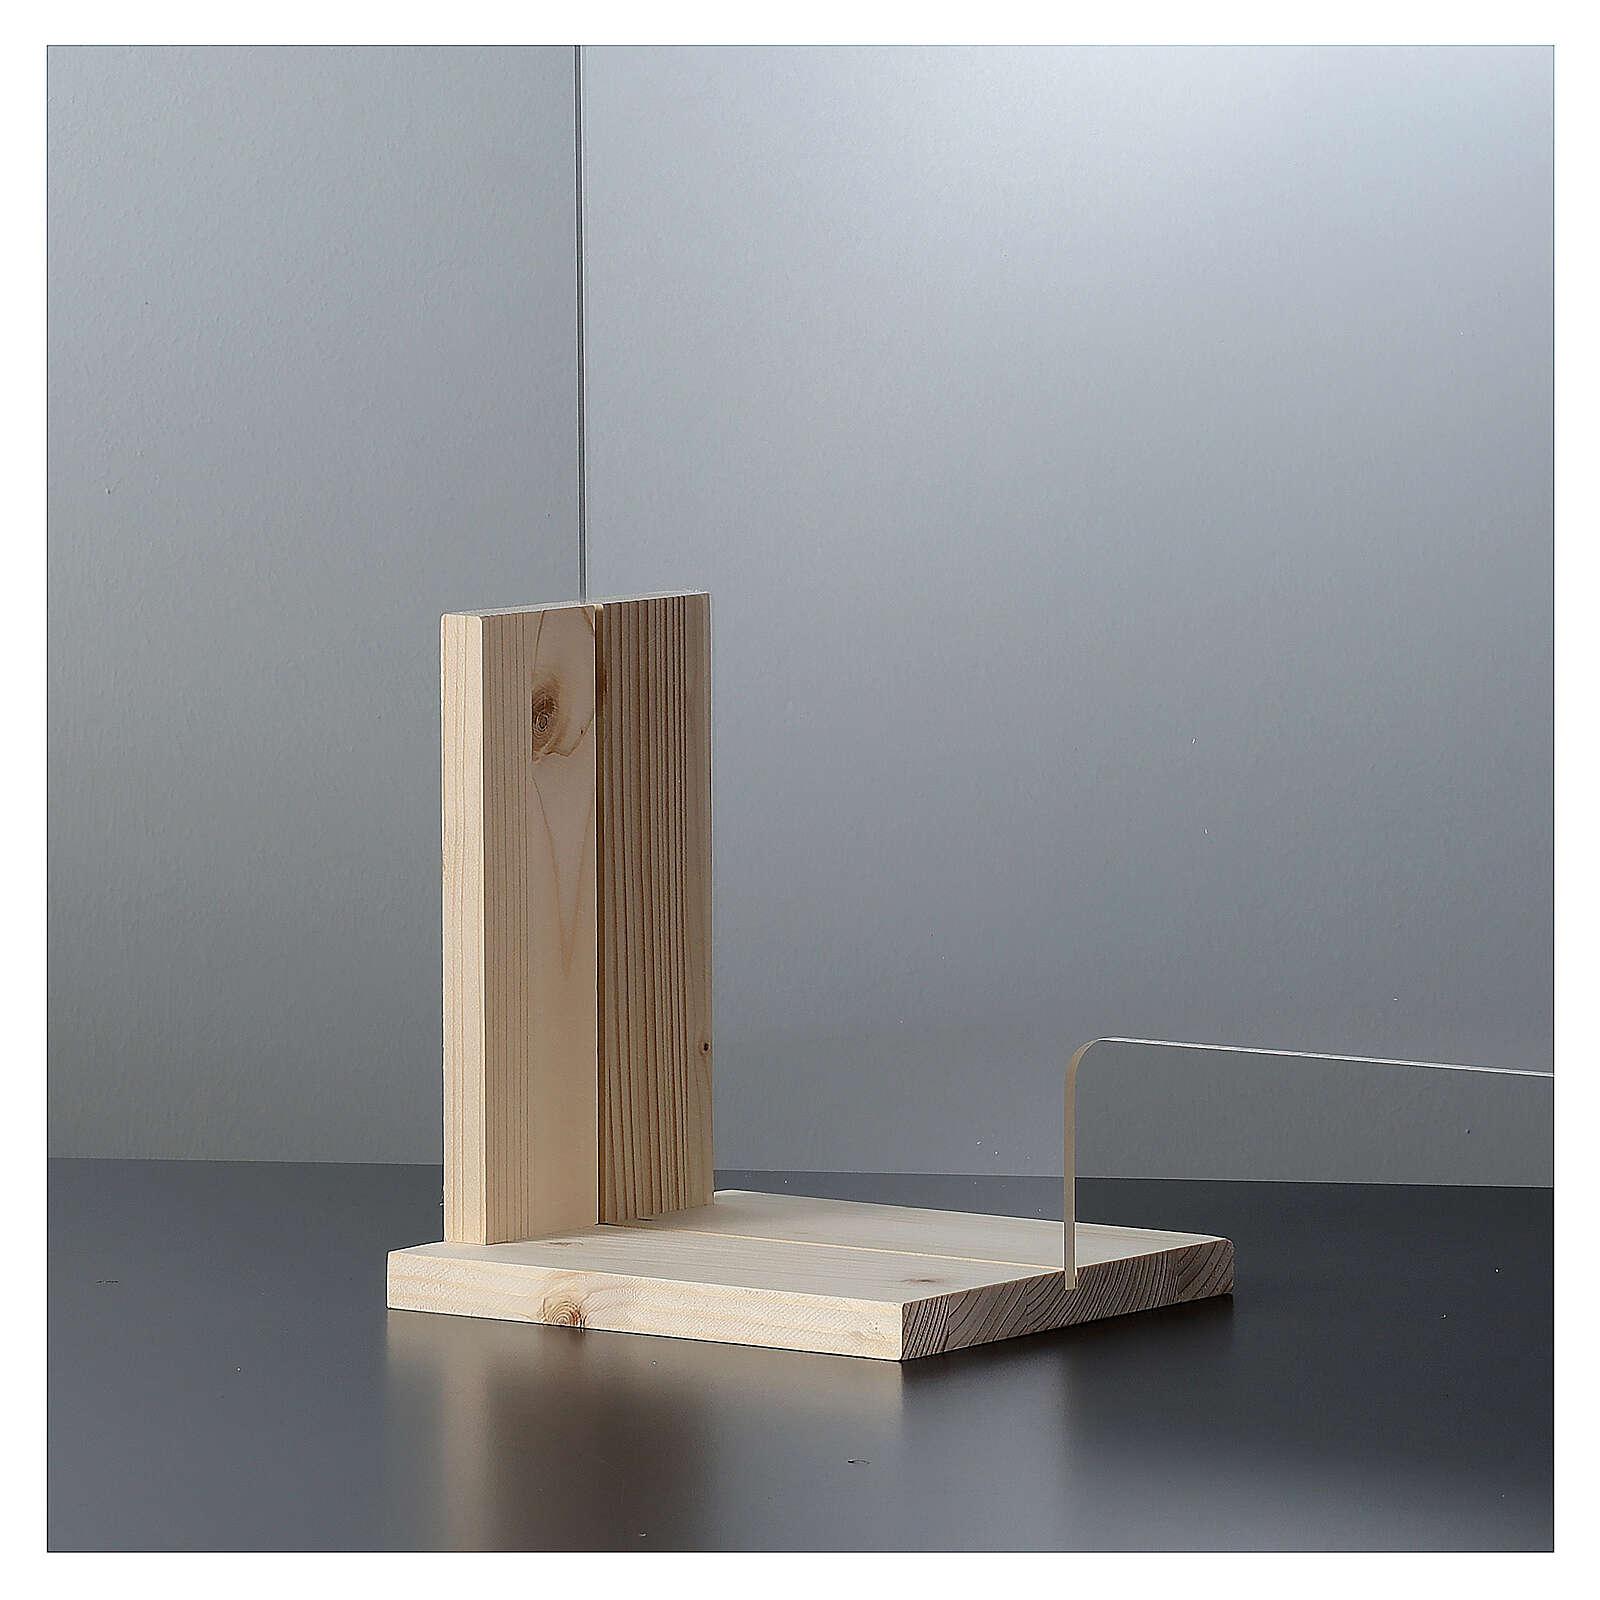 Panel Anti-aliento Design Wood h 65x95 - ventana h 8x32 3